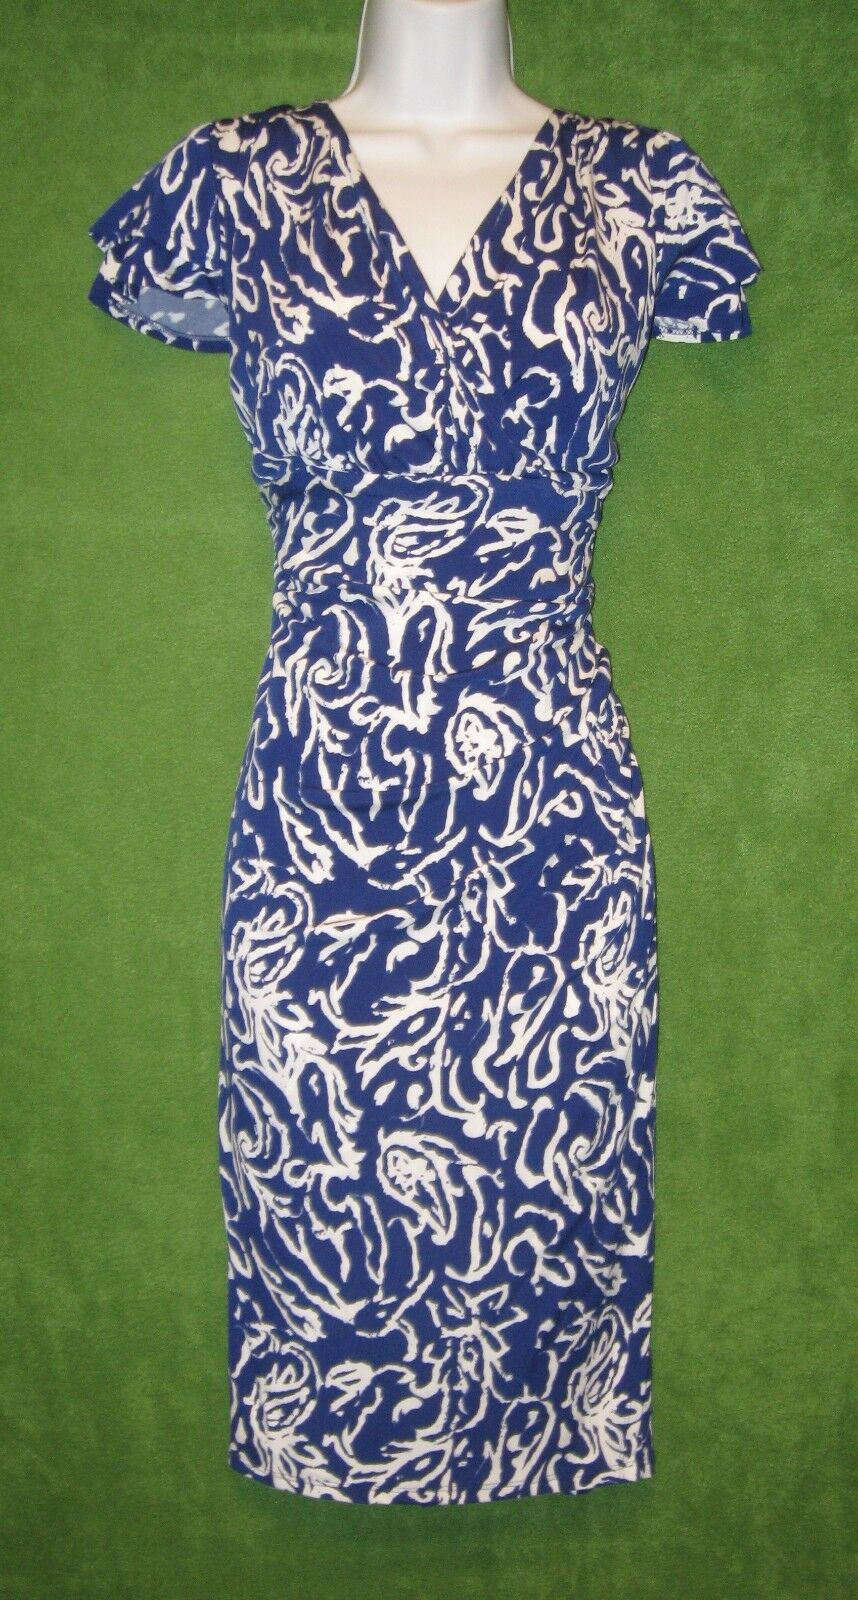 dce08bfee20232 LRL Ralph Lauren Blau Weiß Stretch Jersey Ruched Social Dress 22W PLUS